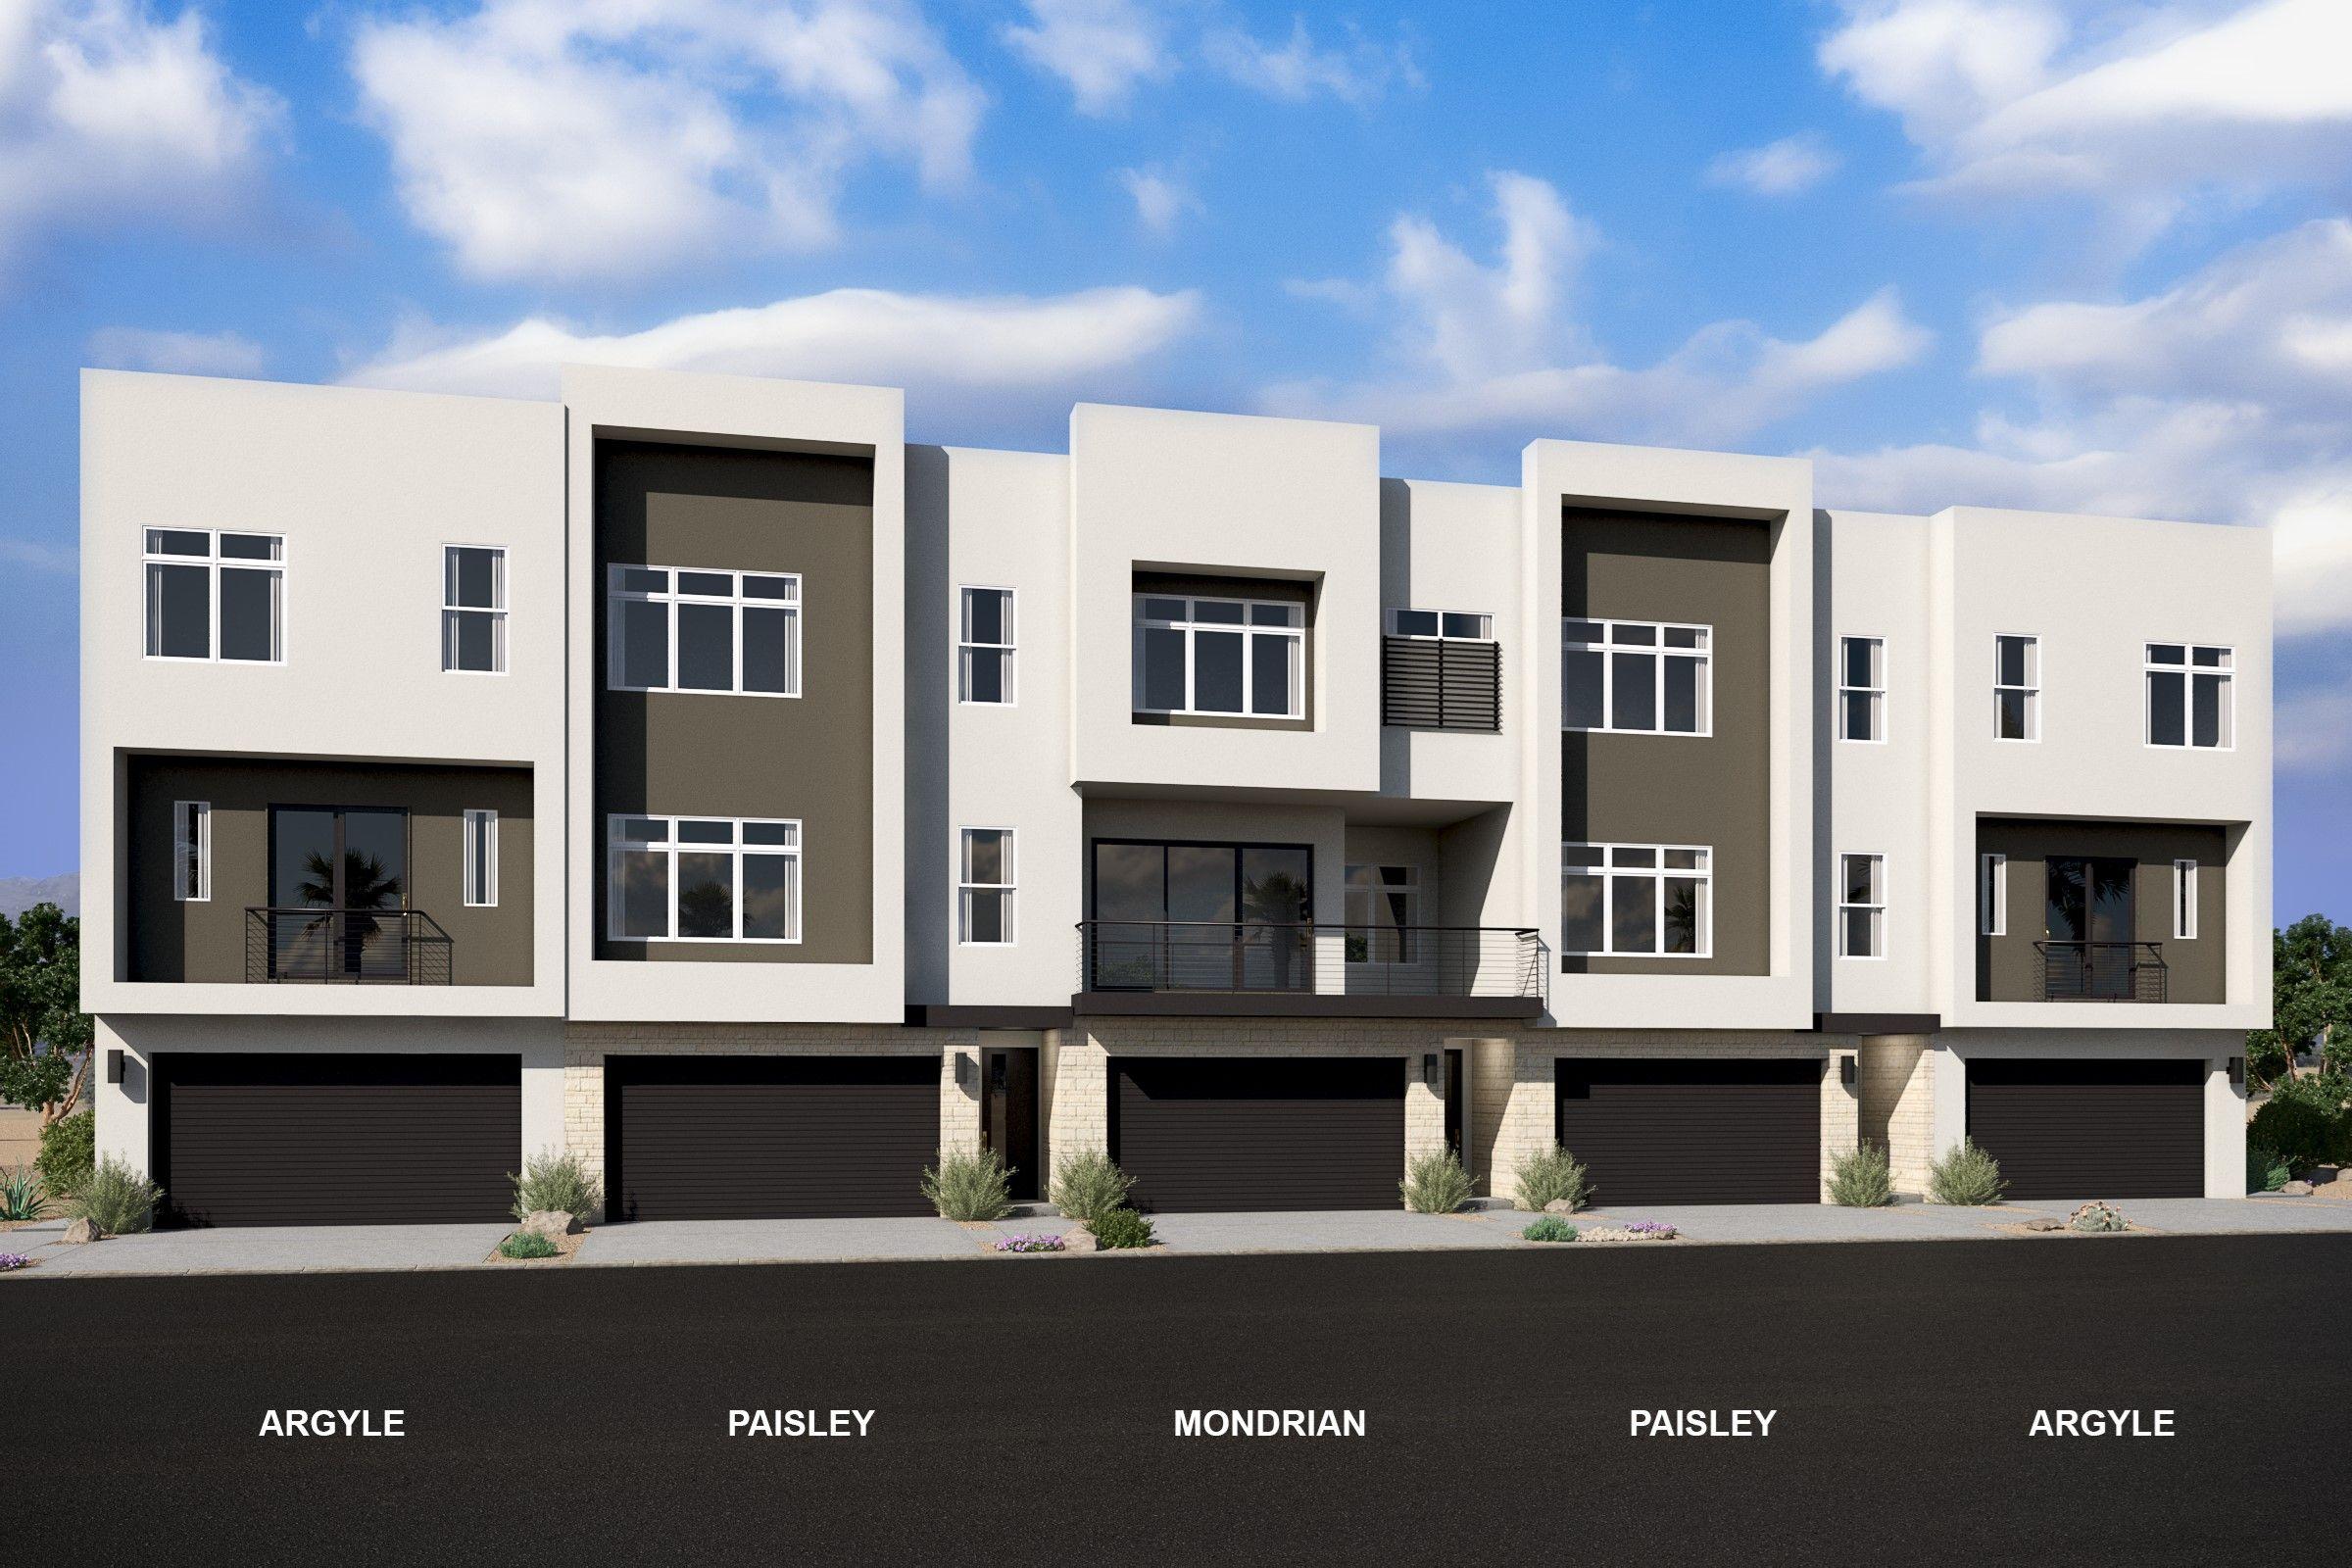 Multi Family for Sale at Paisley 3112 North 71st Street, Homesite 5 Scottsdale, Arizona 85251 United States